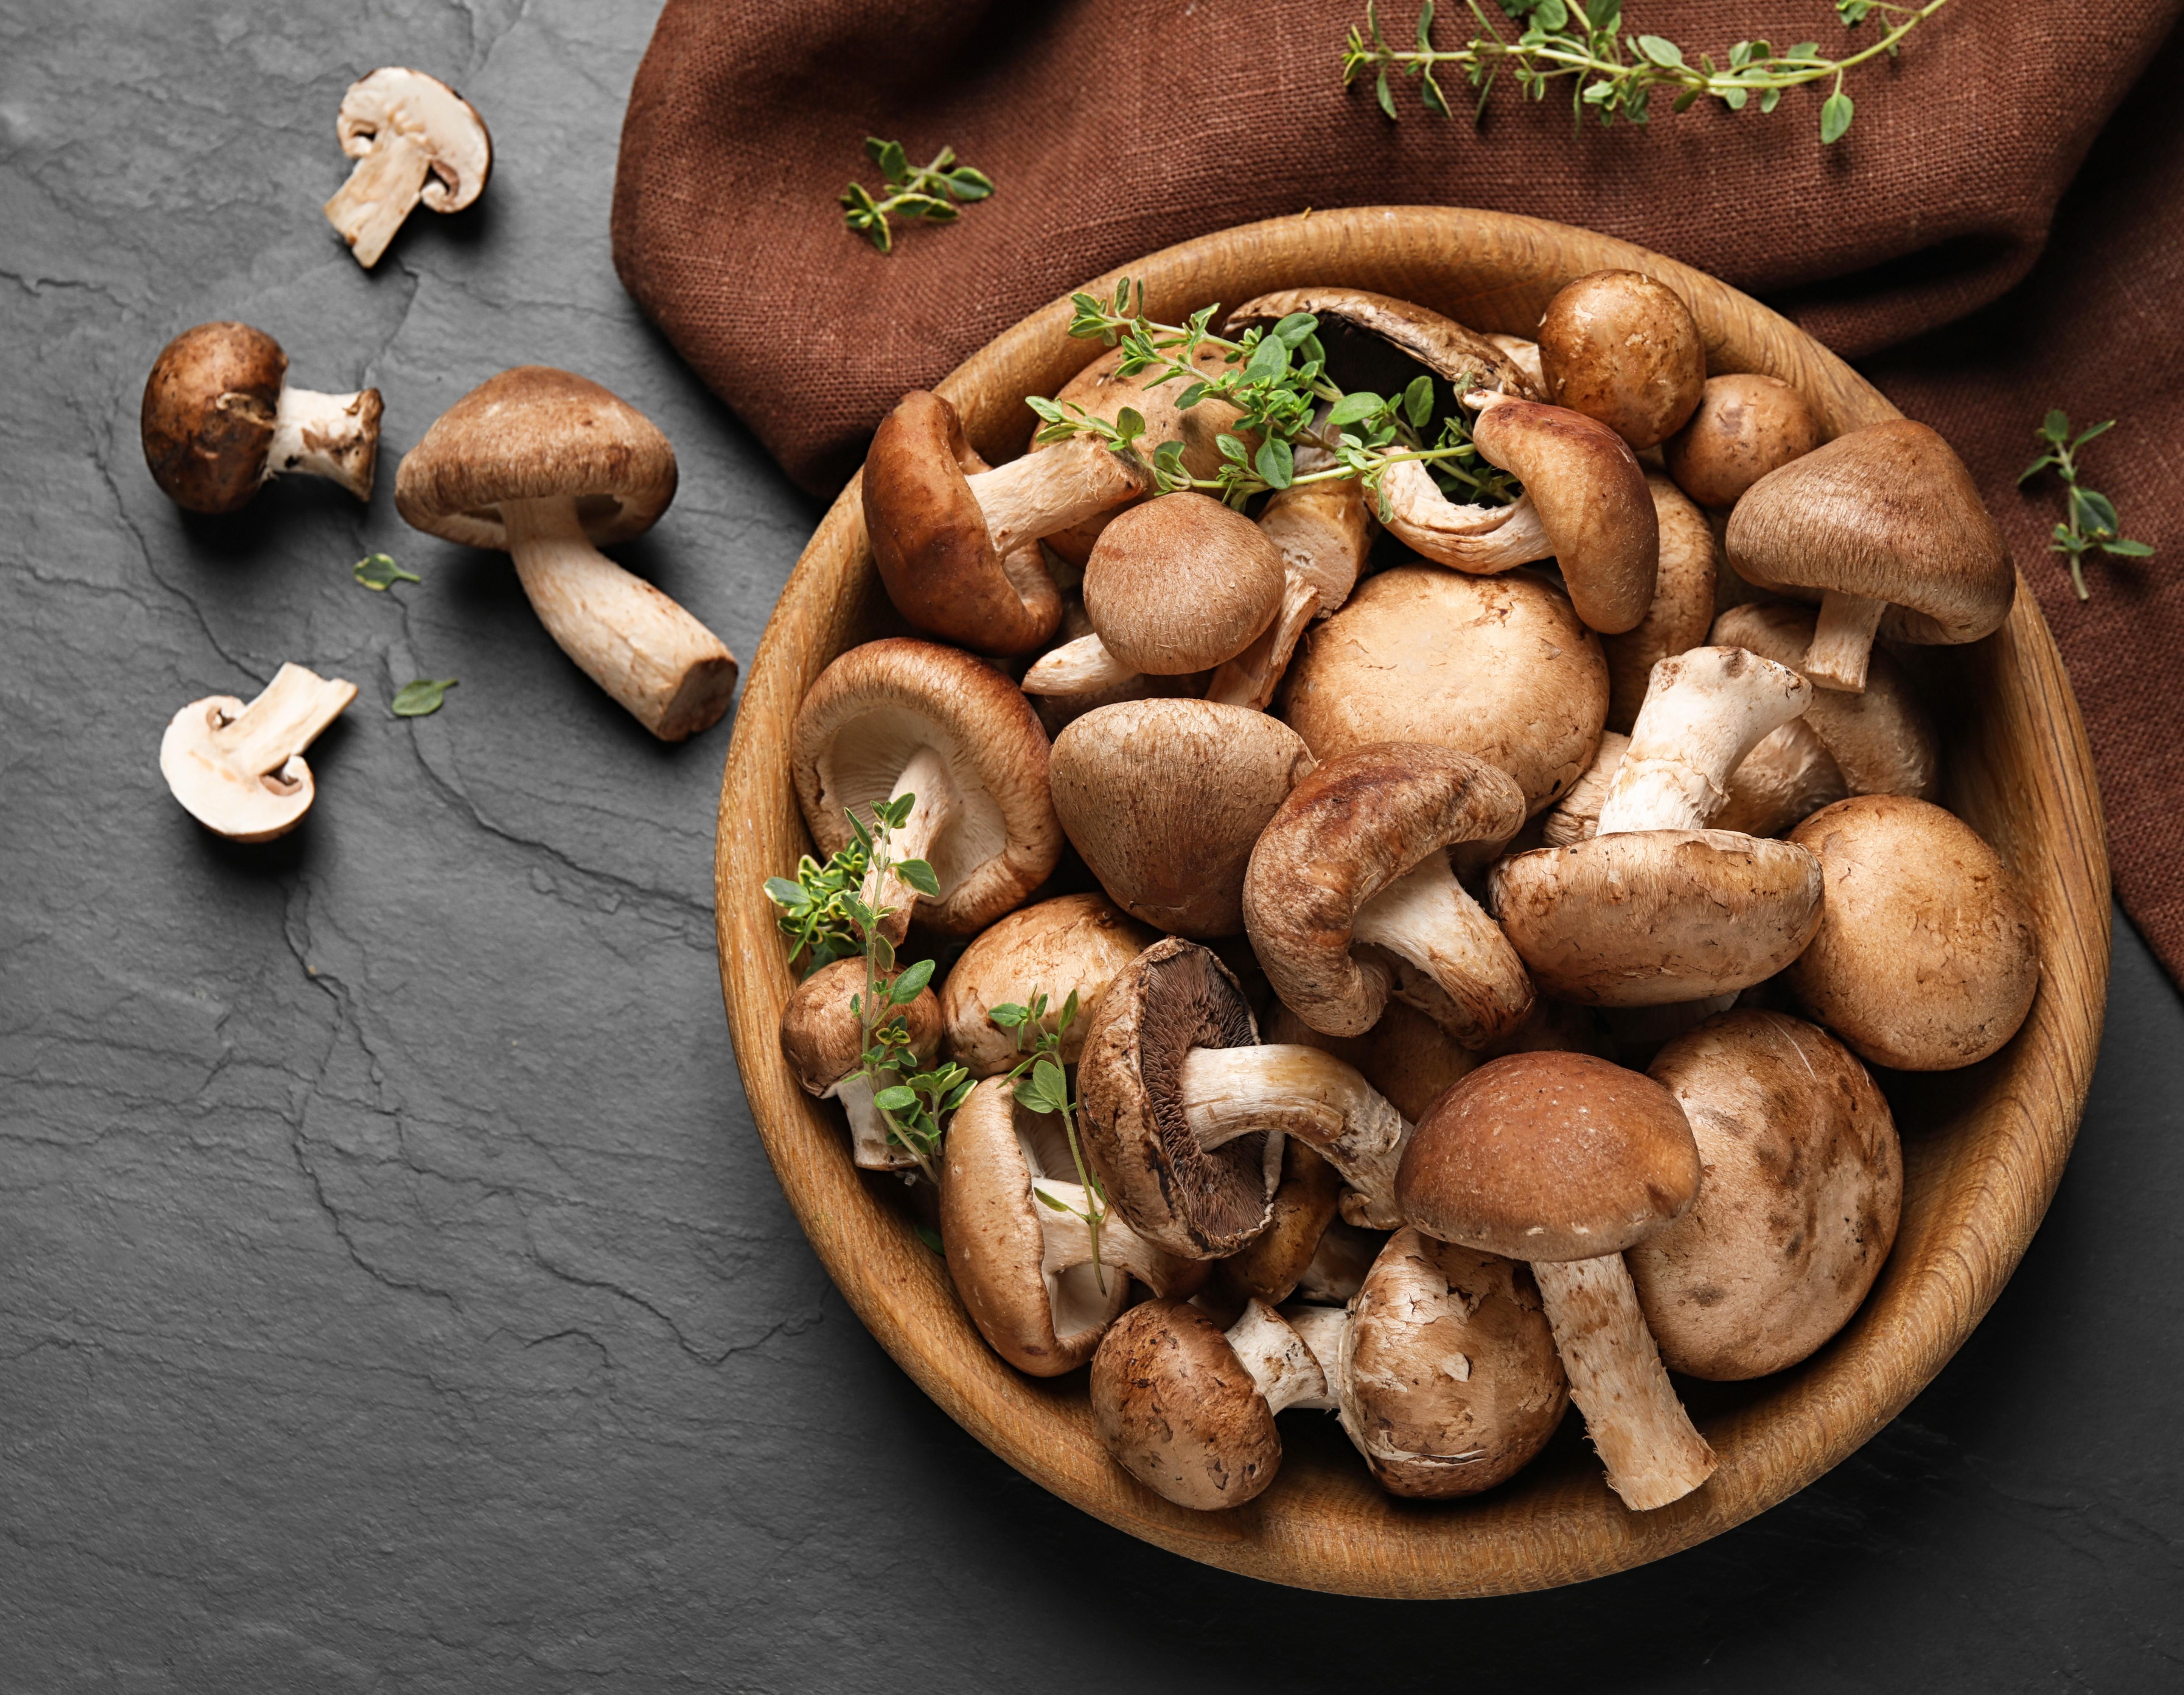 Edible Wild Plants and Mushrooms